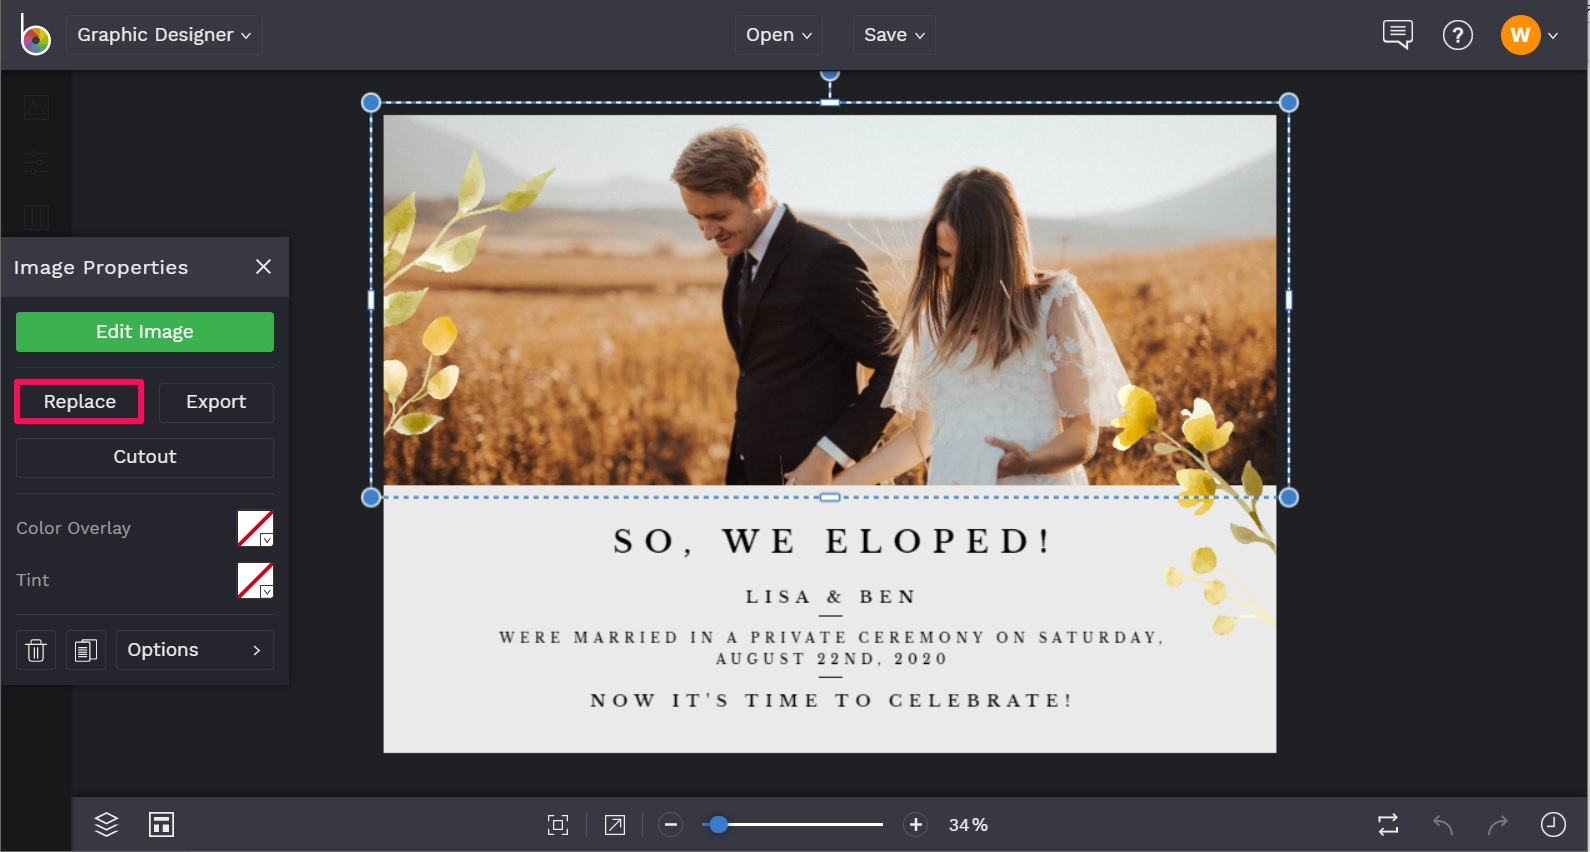 Replace elopement announcement